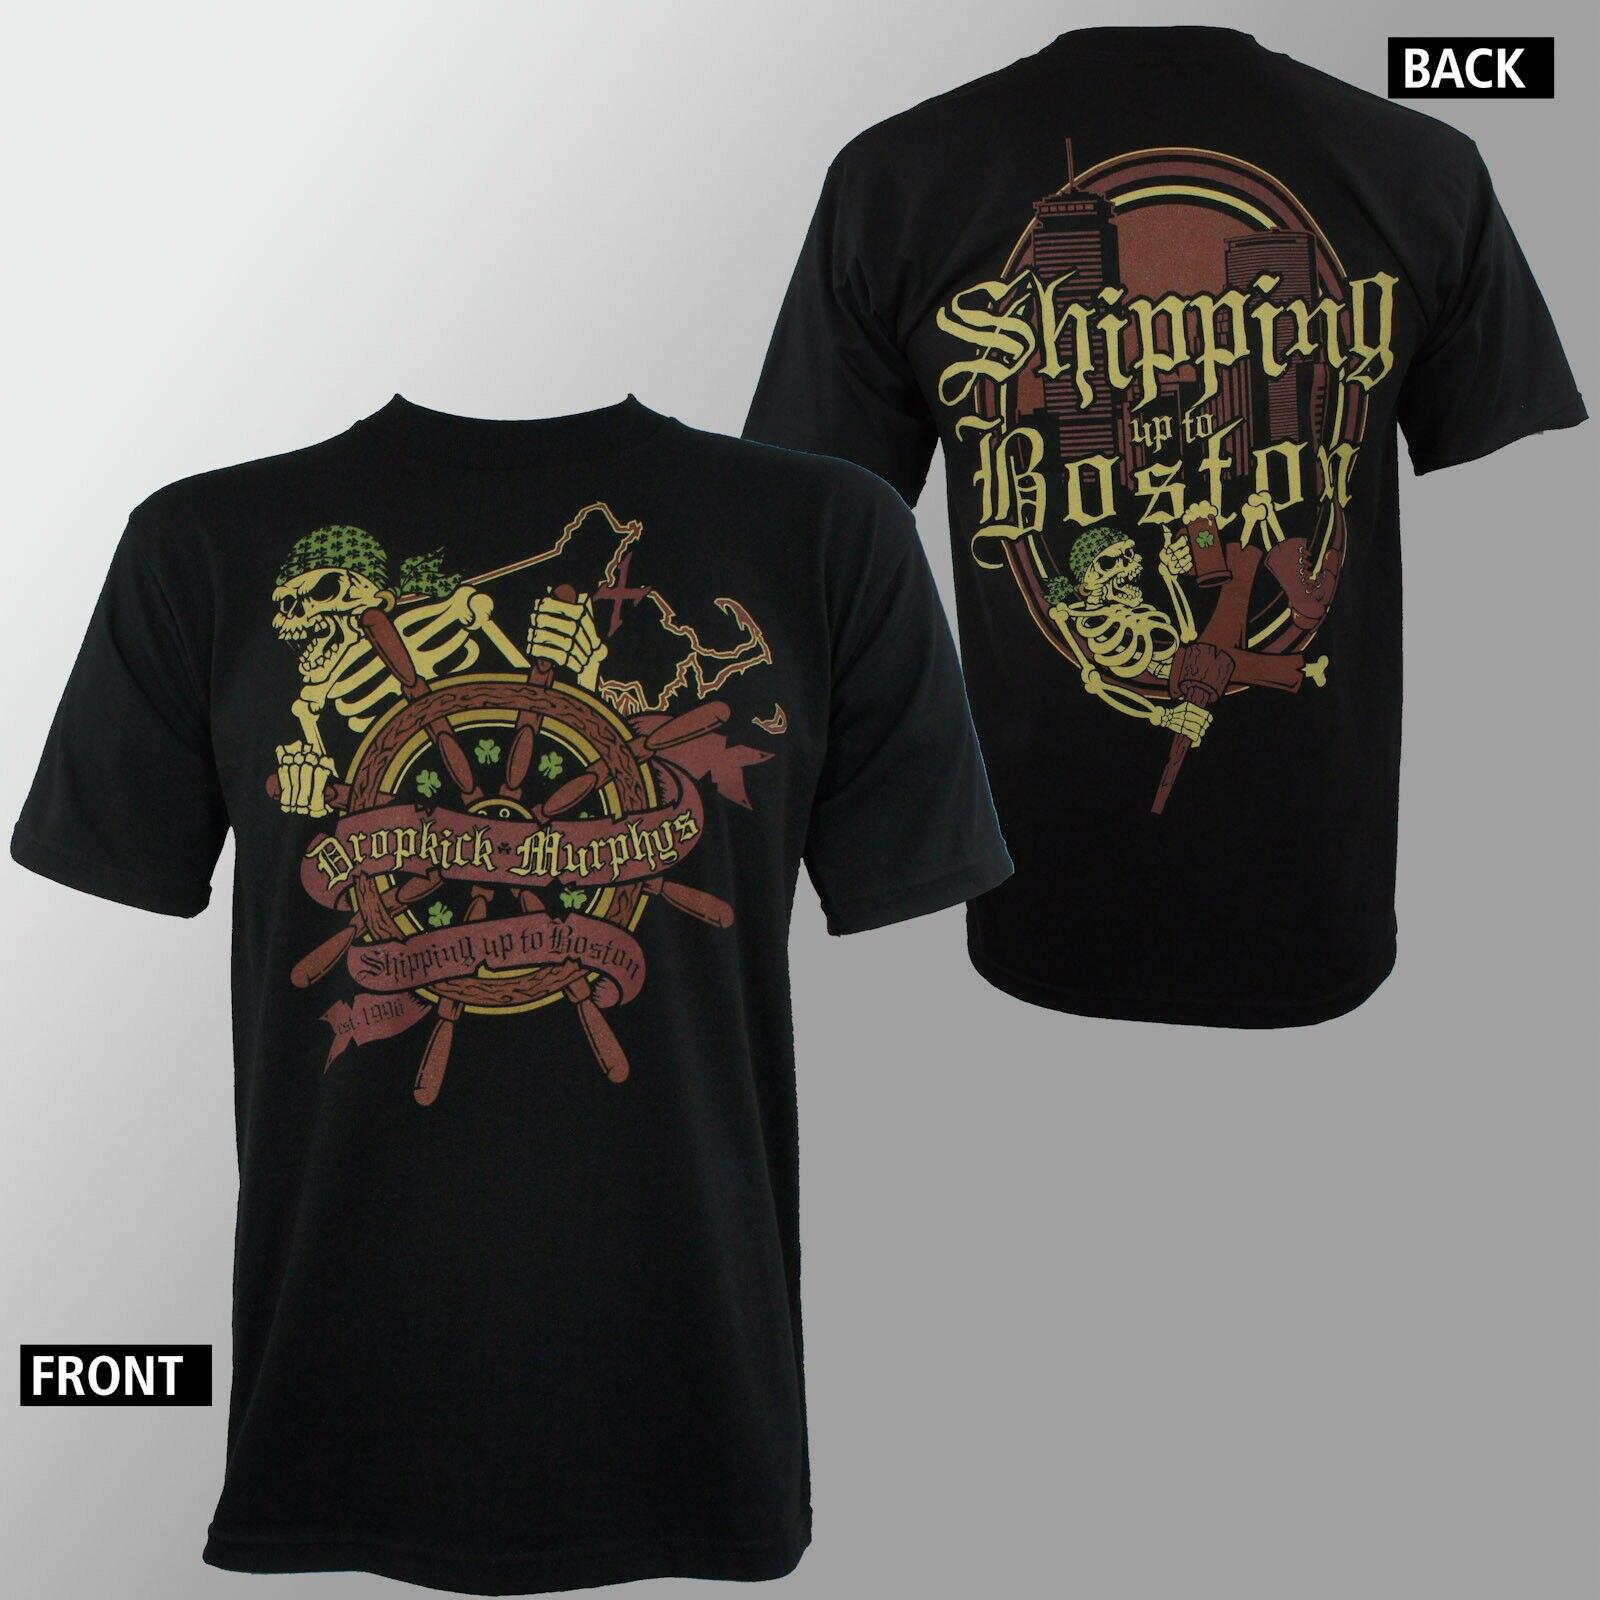 Authentic DROPKICK T Shirt For Men Harajuku MURPHYS Shipping Up To Boston T-Shirt S M L XL 2XL NEW